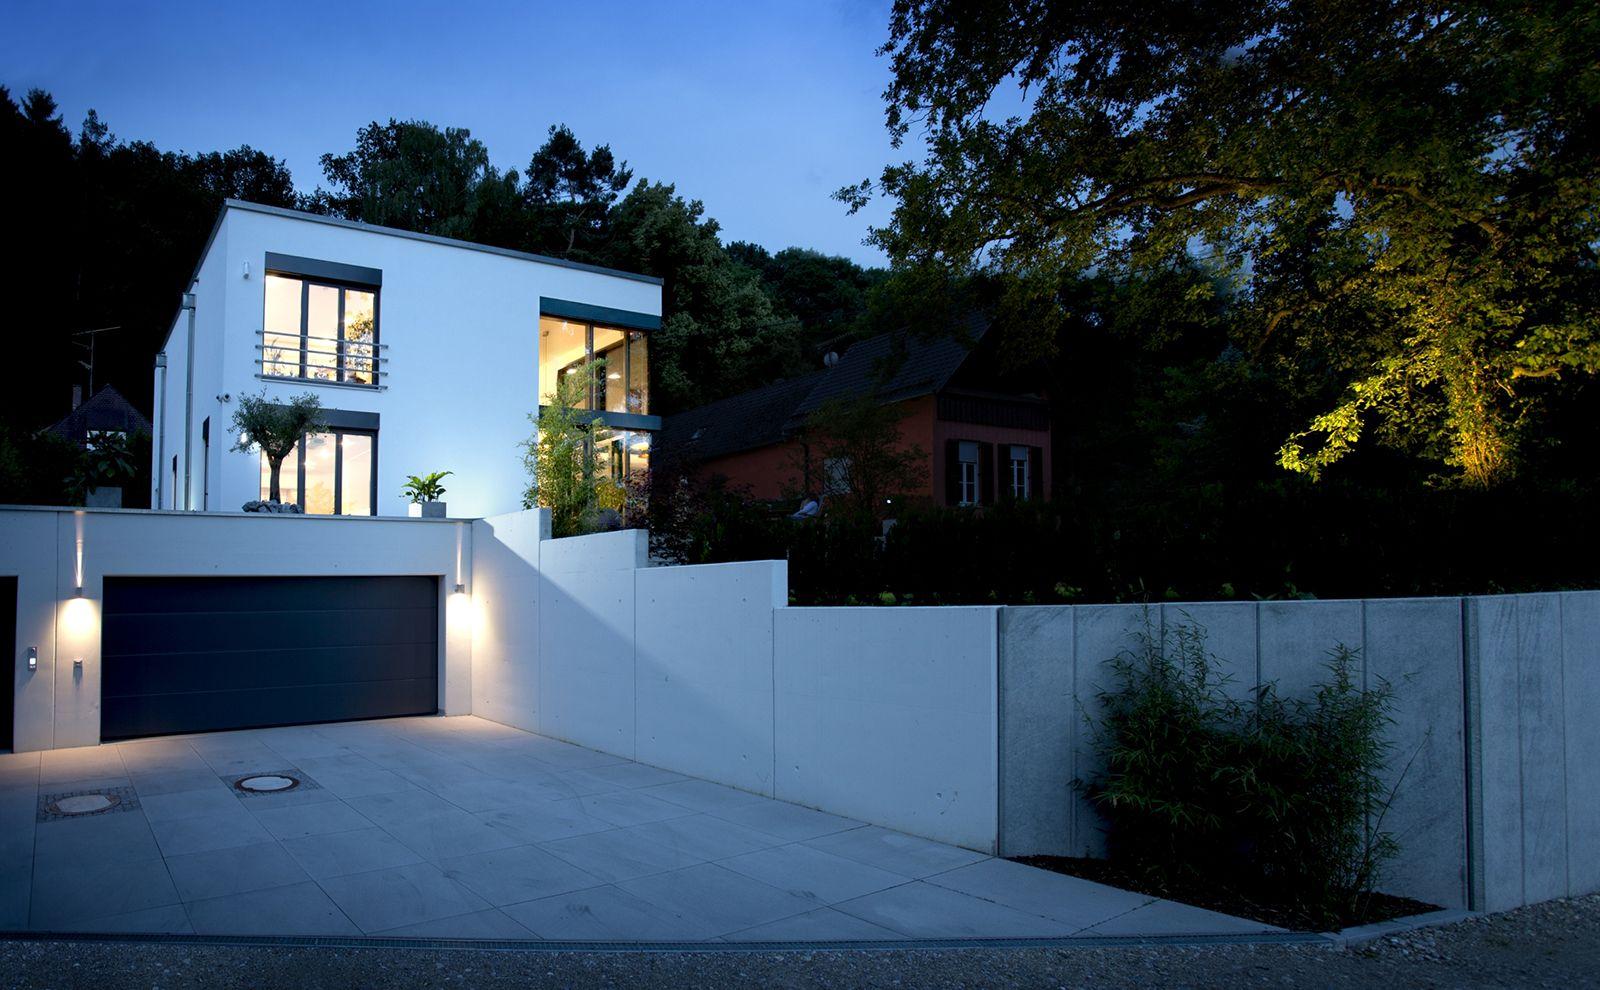 Weißes Haus in Würfeloptik am Waldrand im Dunkeln